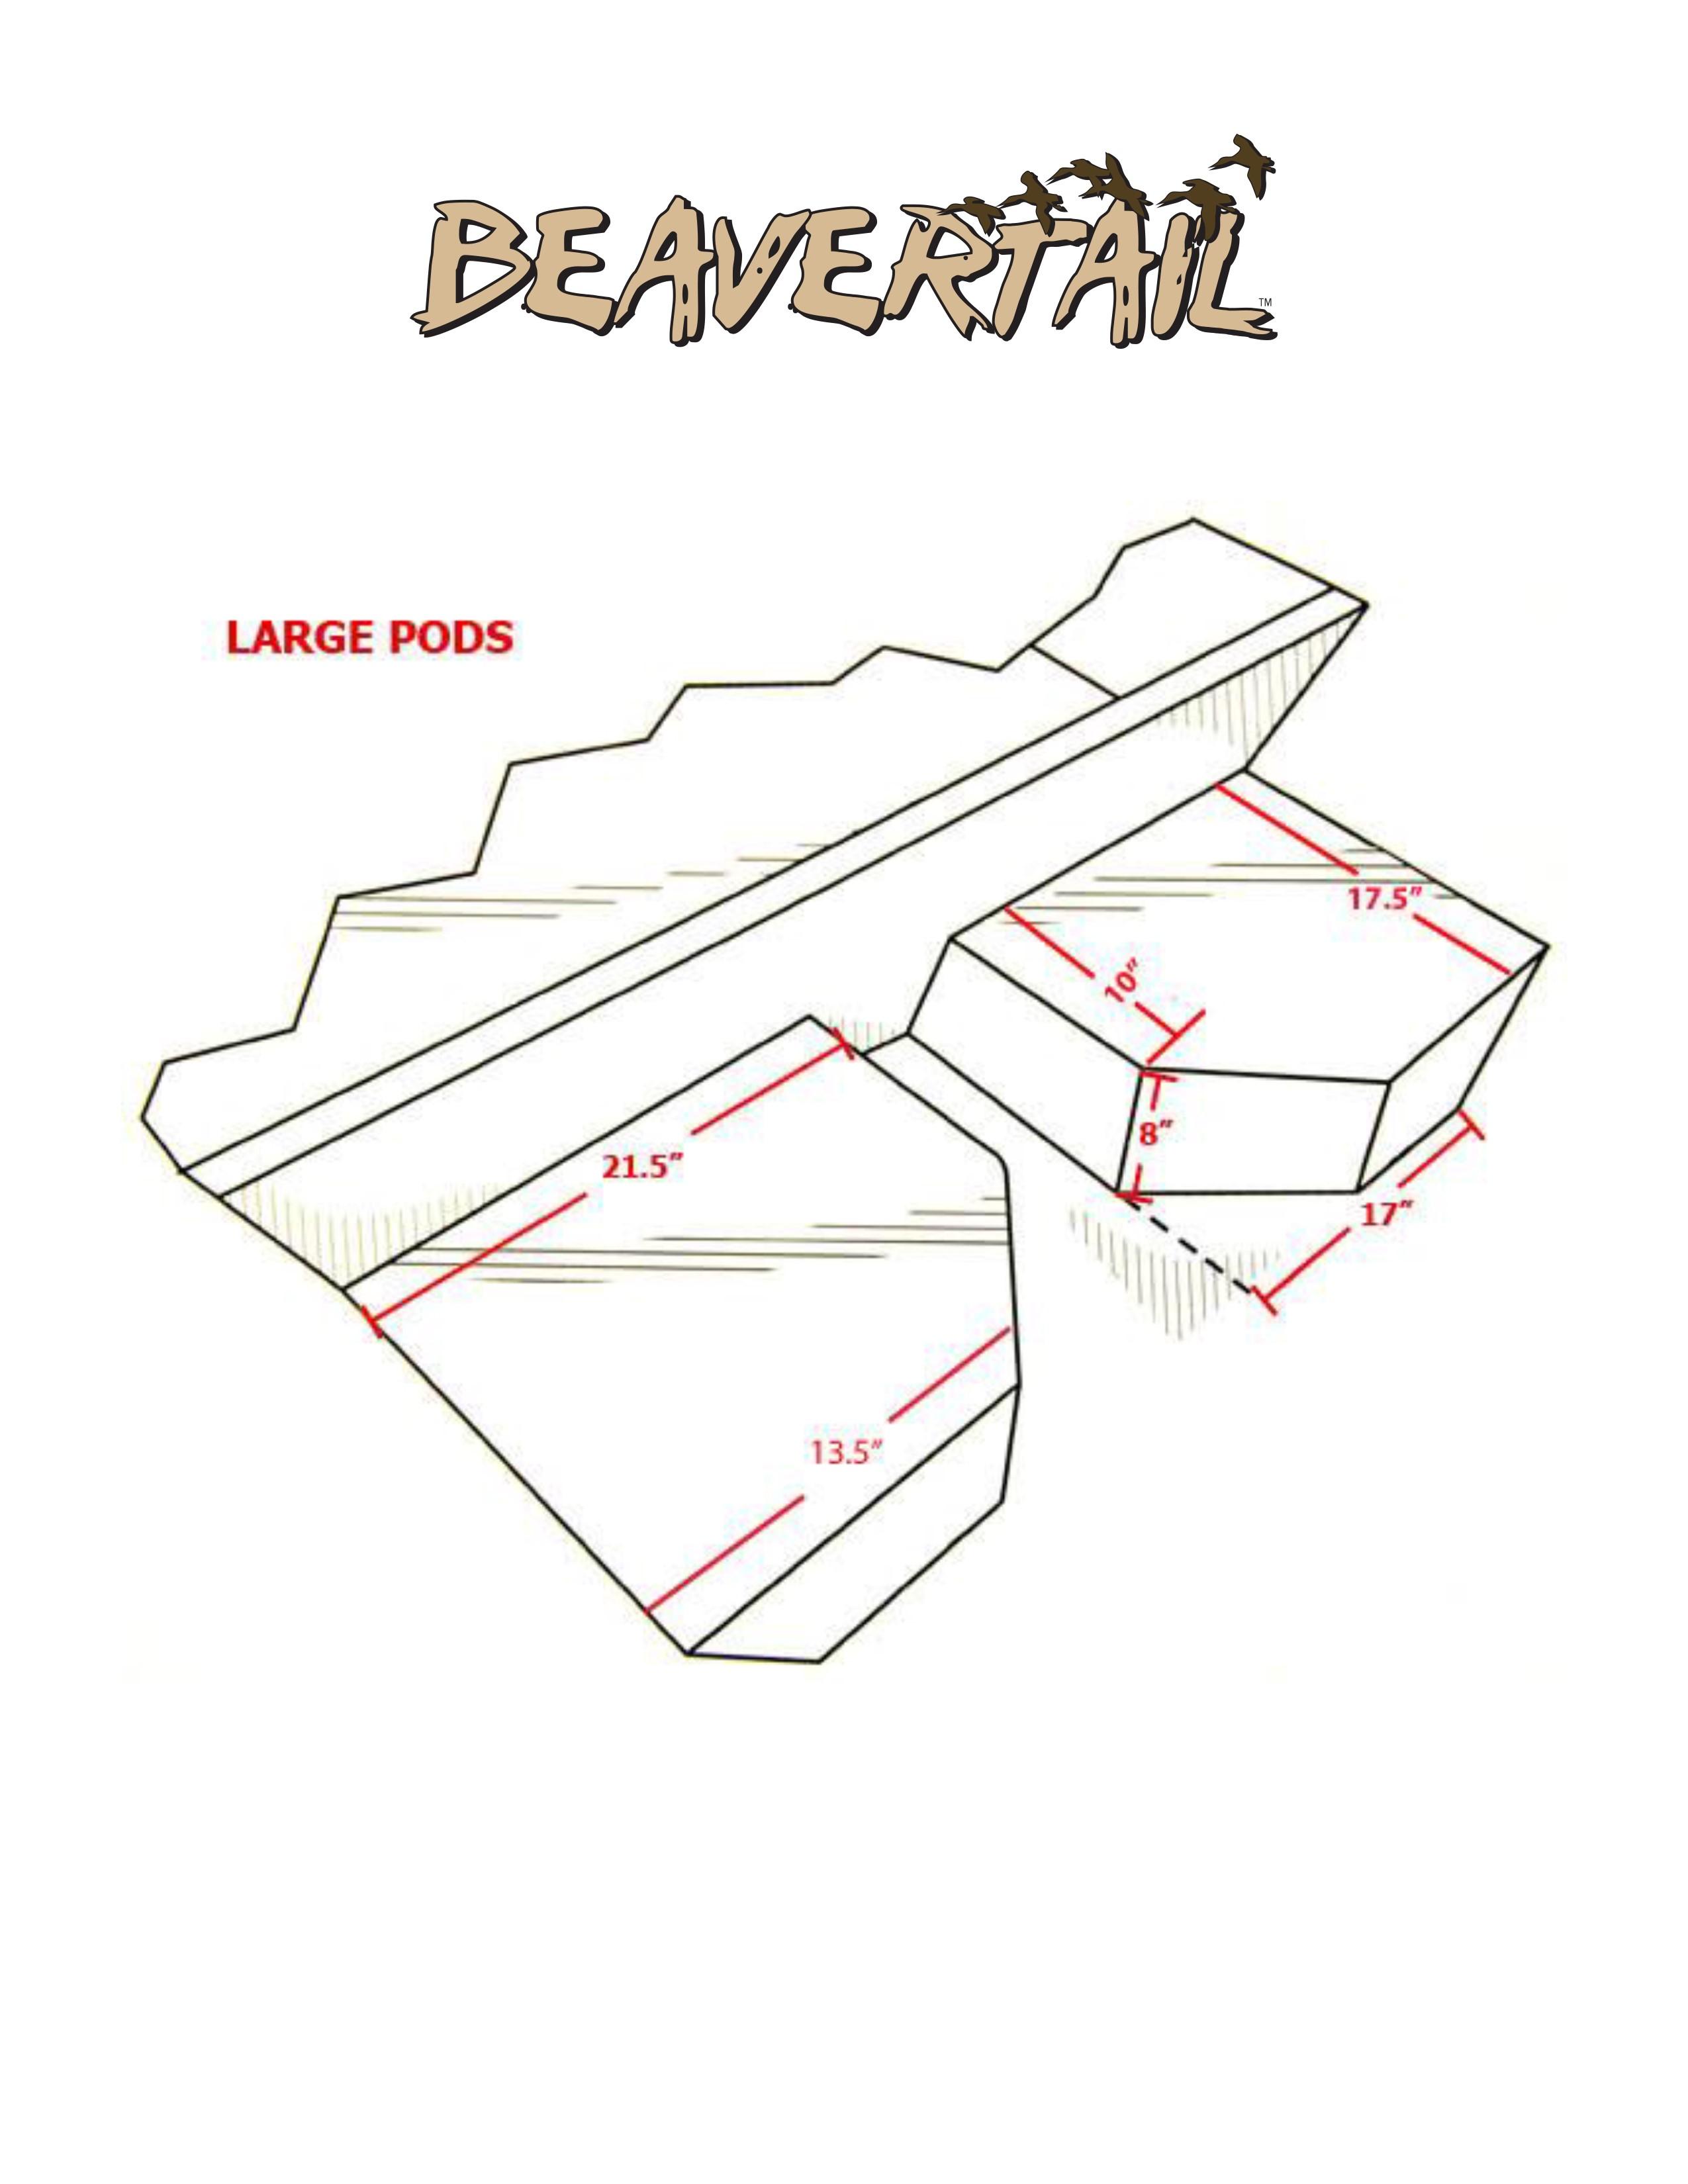 Flotation pods large explore beavertail for Boat motor size calculator